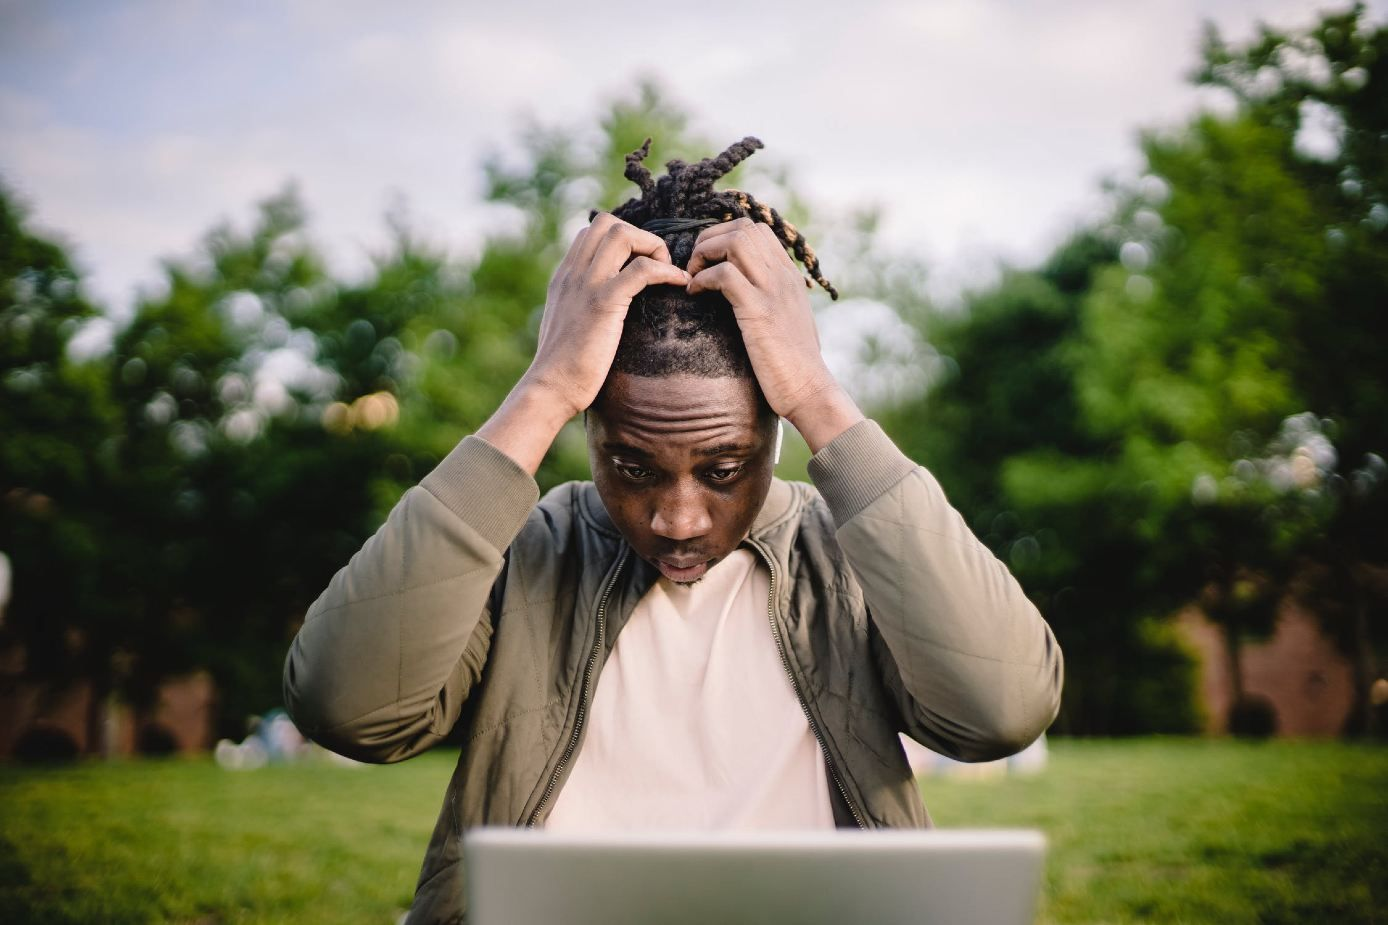 freelancer deciding between full time job